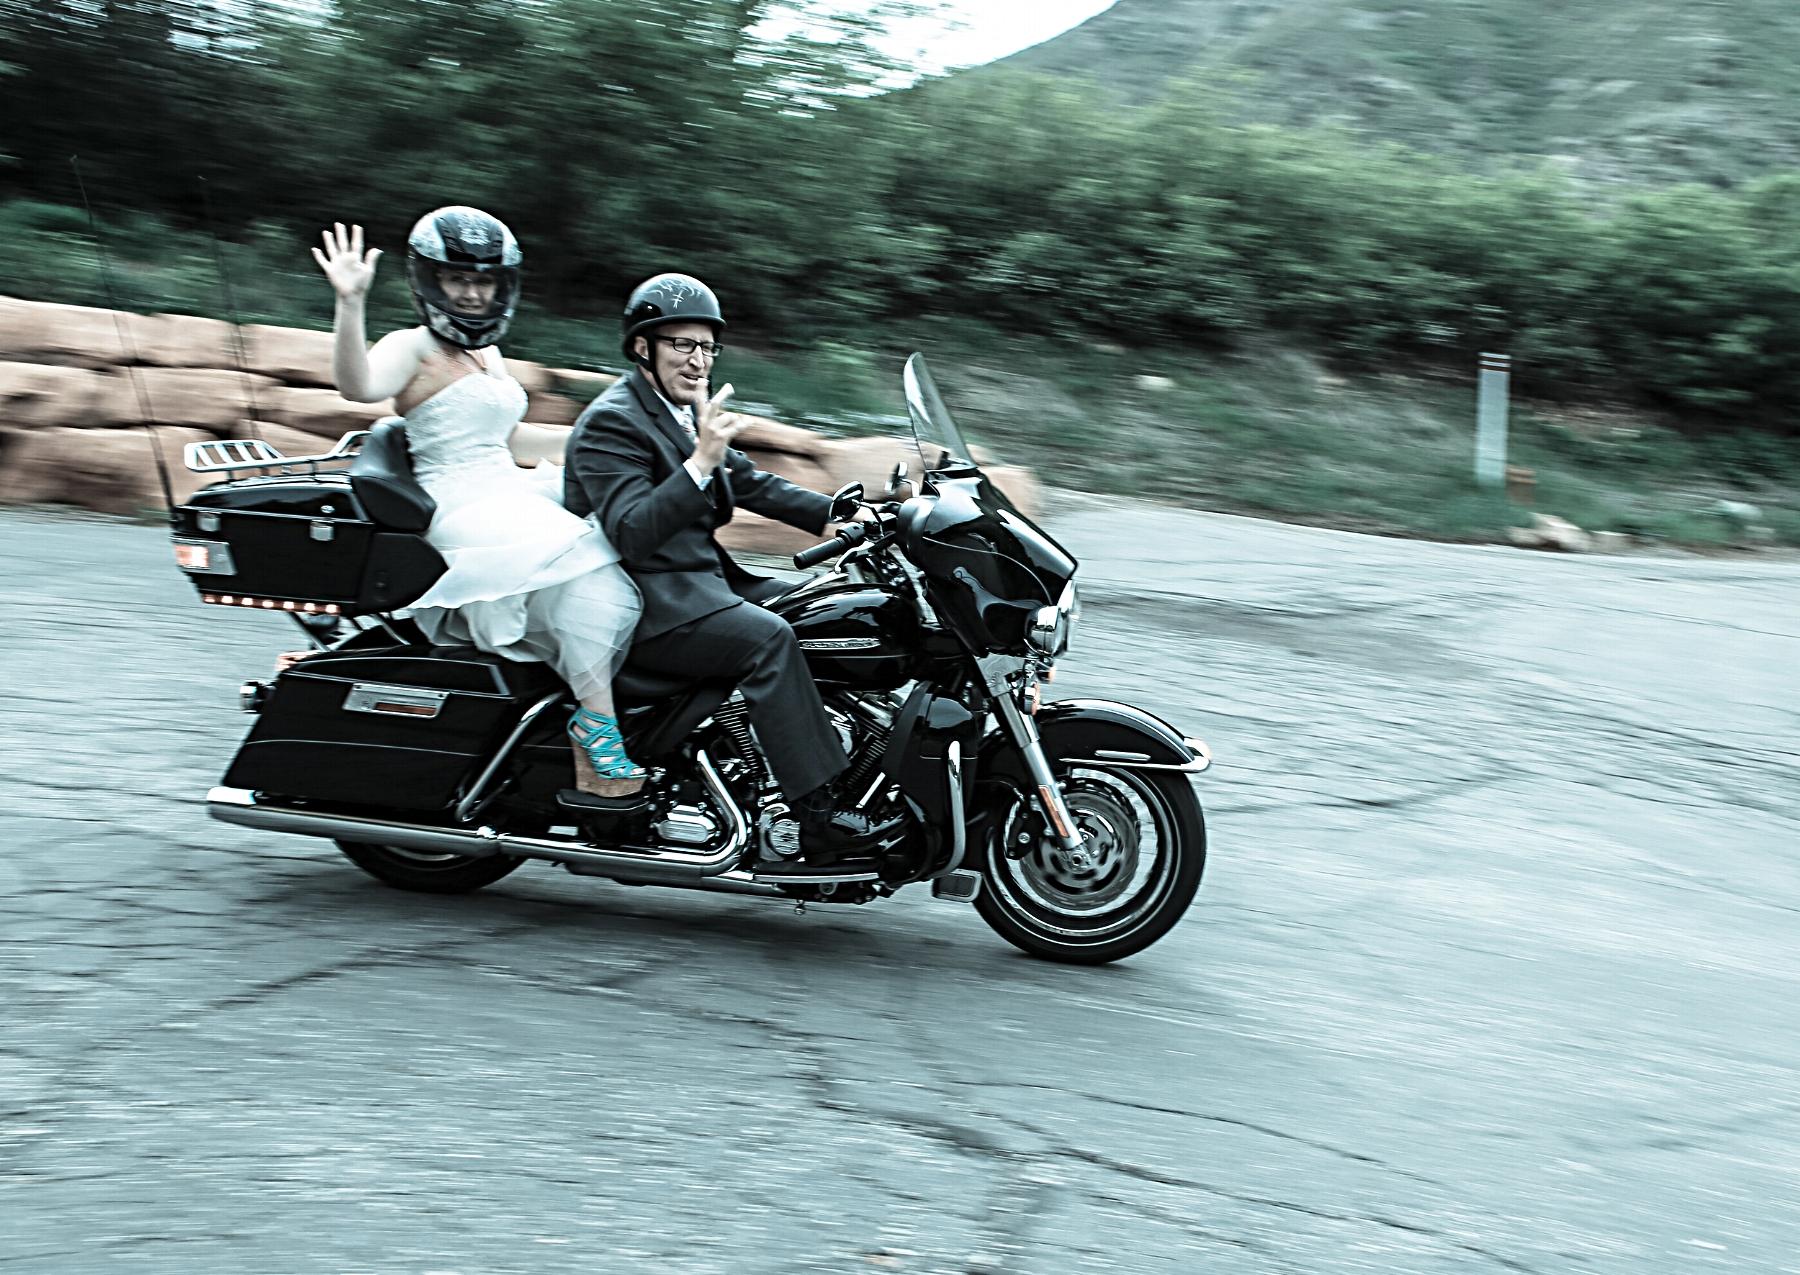 Salt Lake wedding photography send off